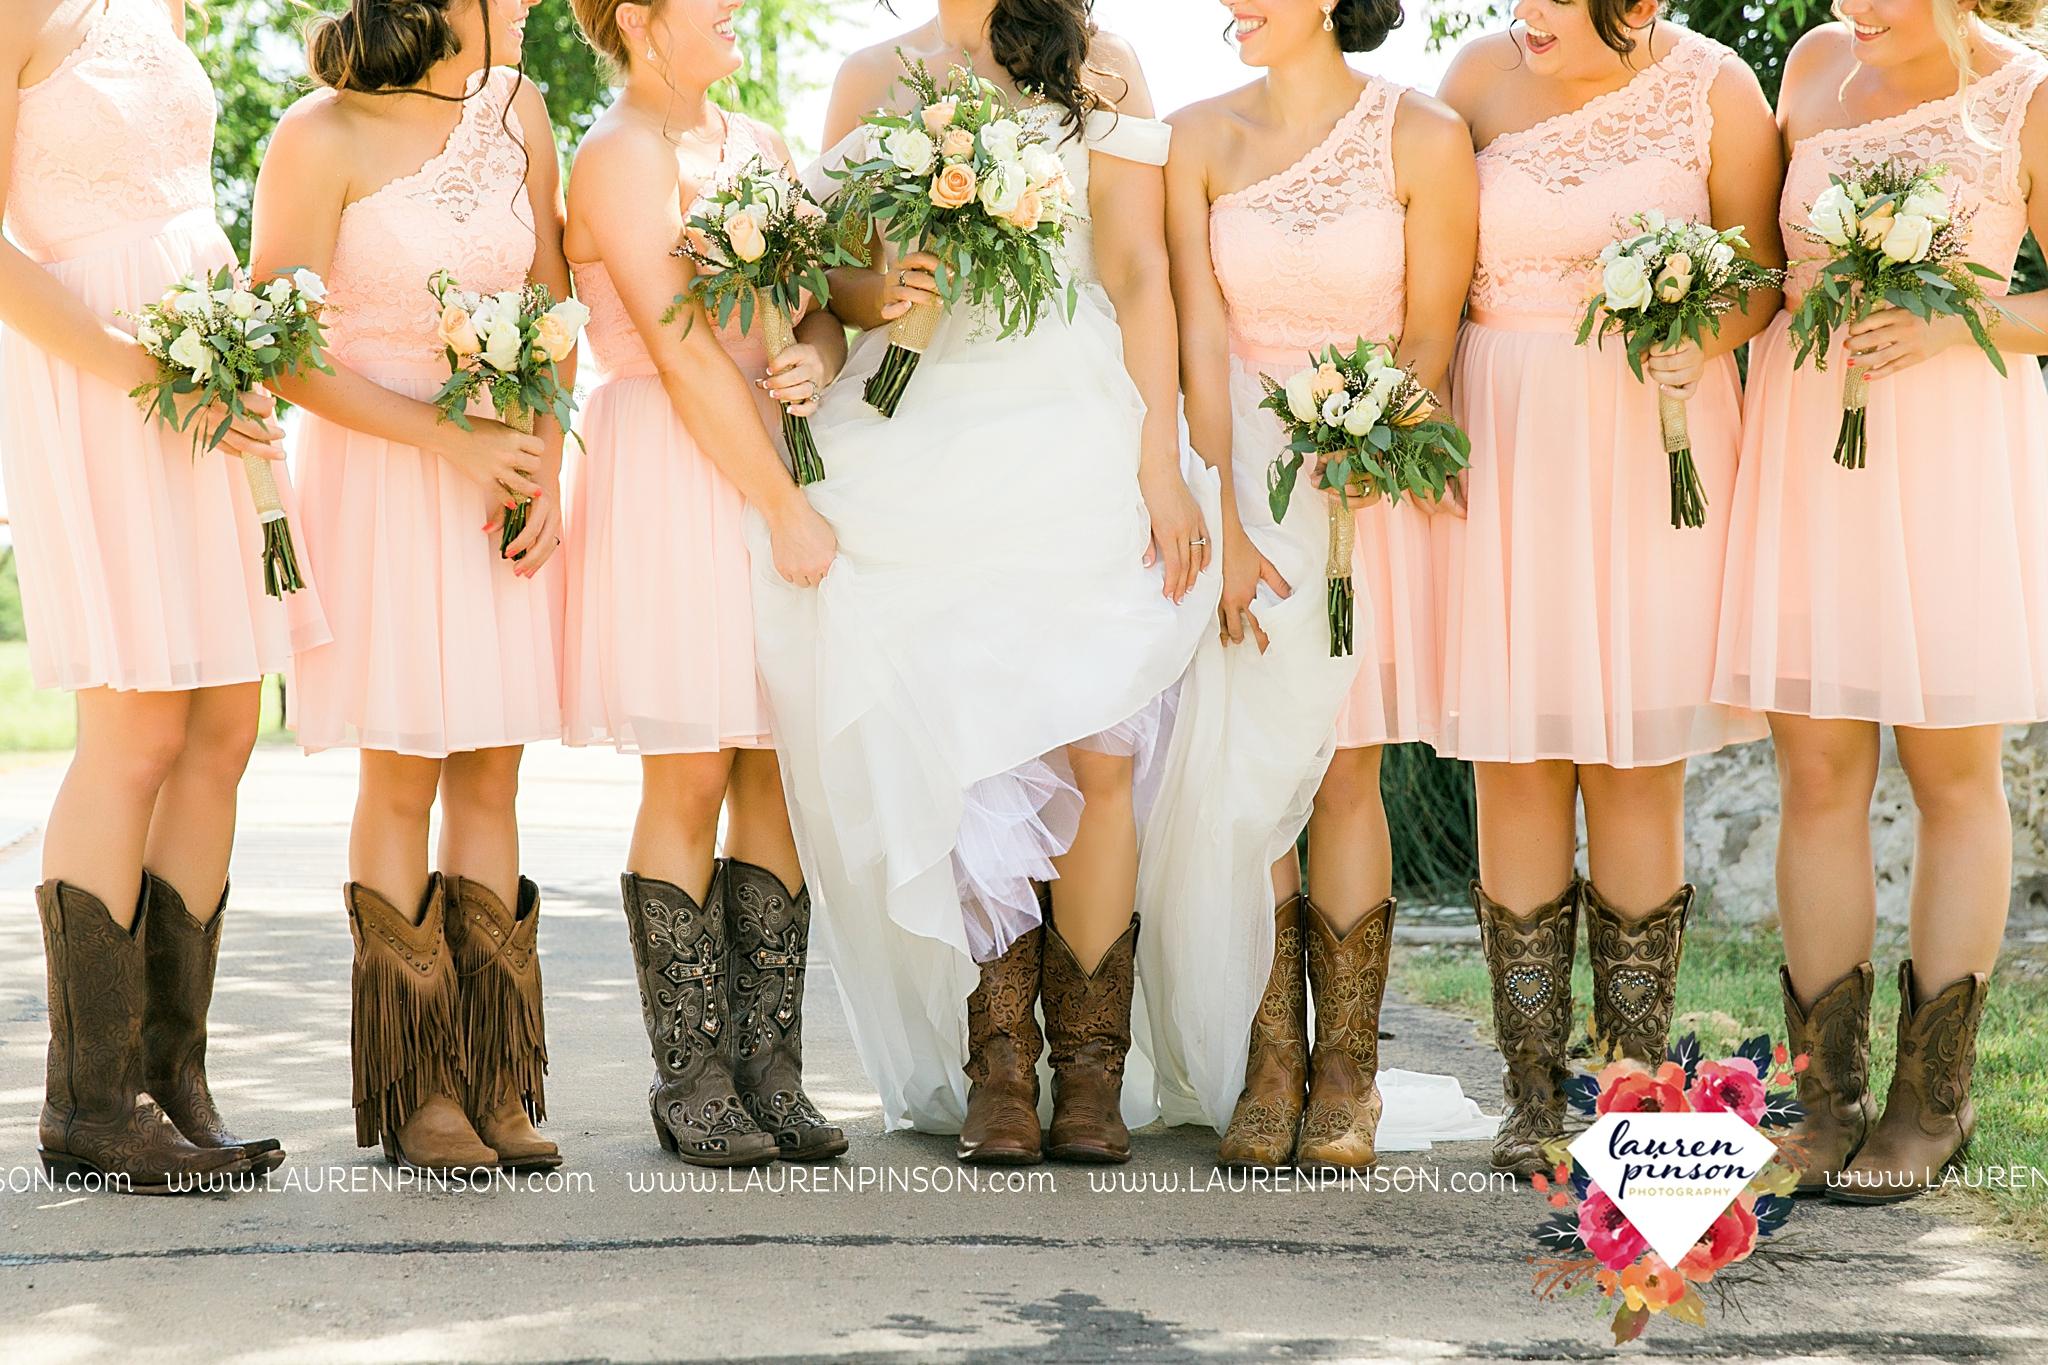 jones-barn-willow-creek-ranch-wedding-in-cleburne-texas-fort-worth-dfw-wichita-falls-wedding-photography_3214.jpg